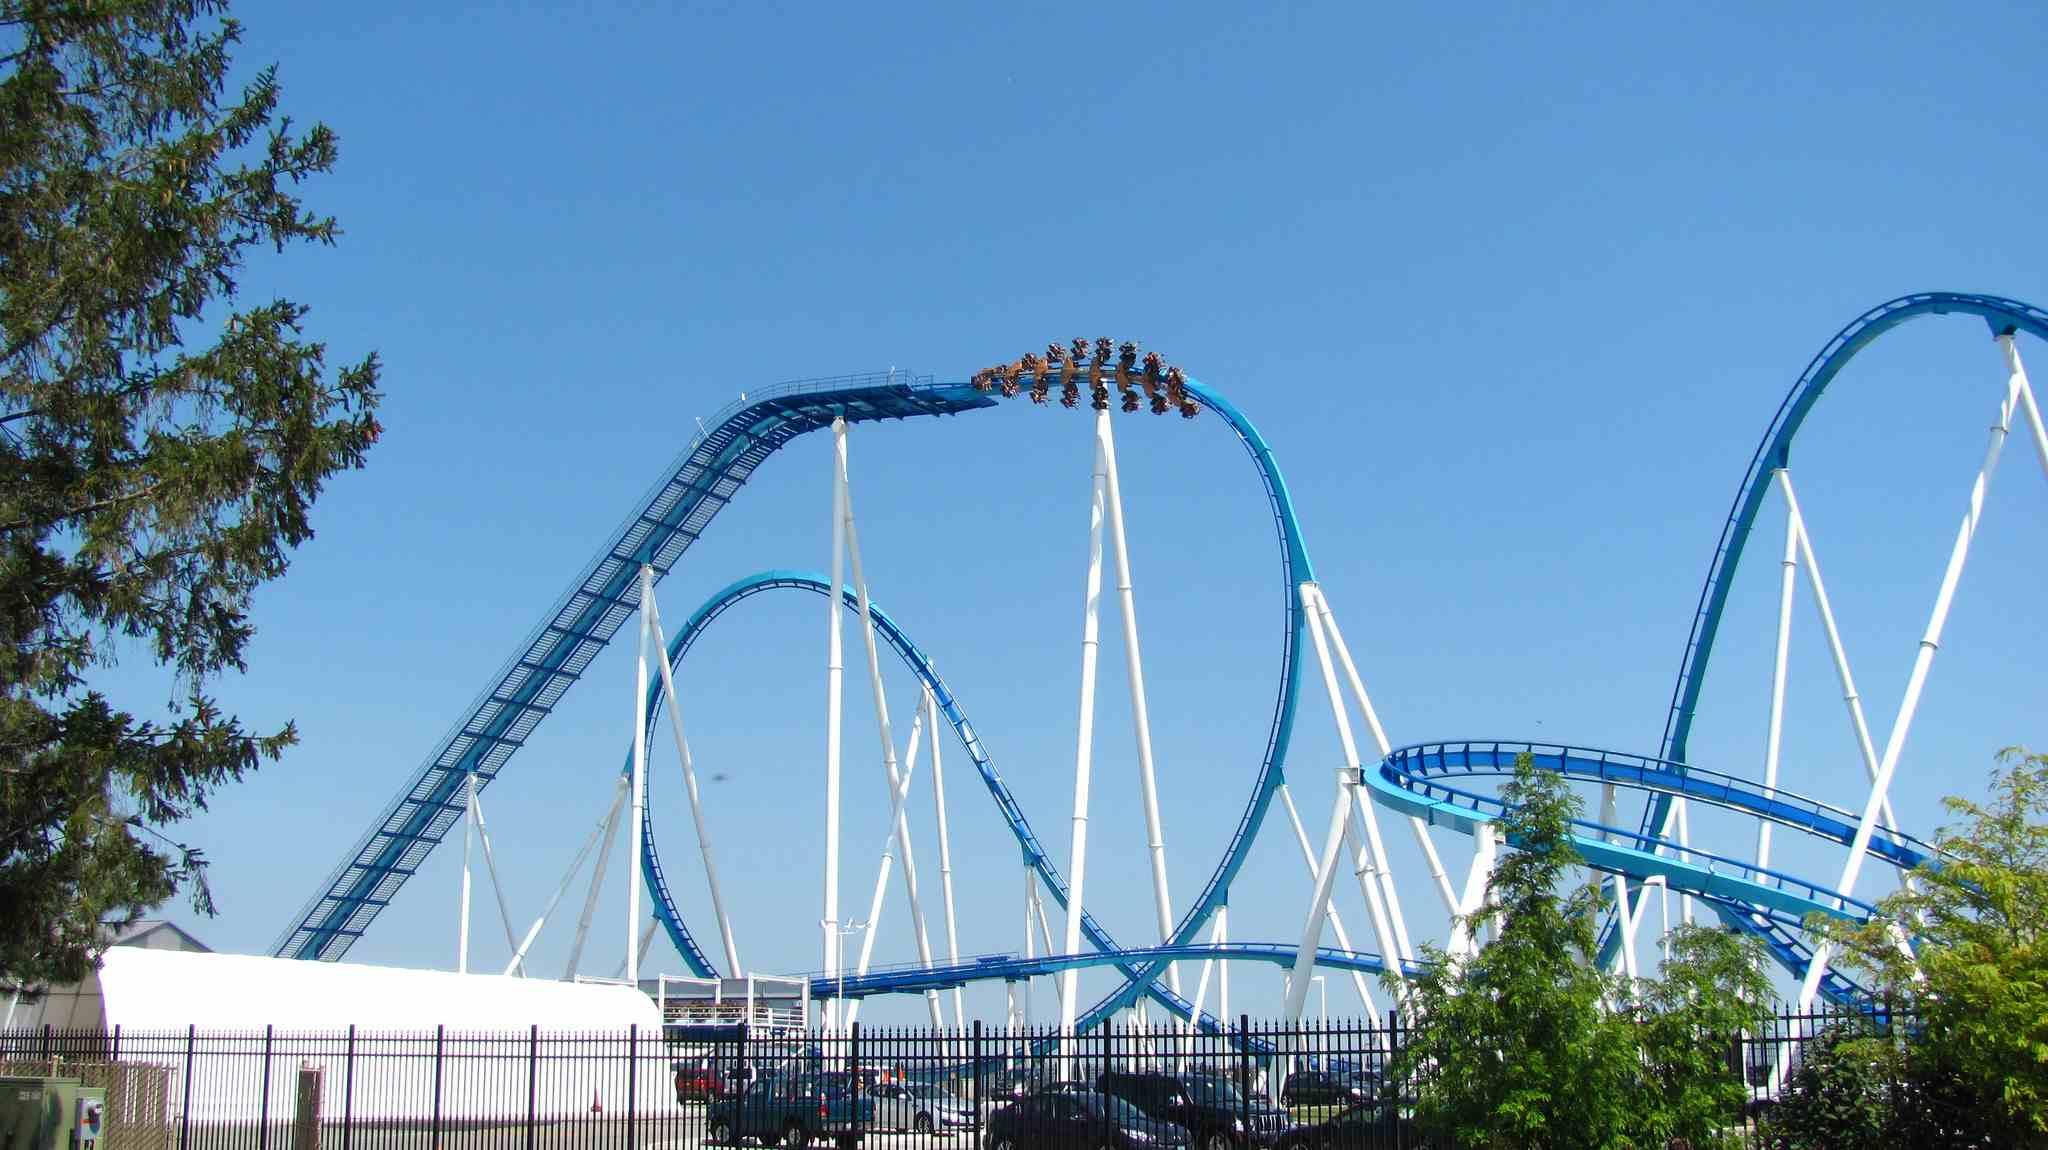 GateKeeper Roller Coaster at Cedar Point